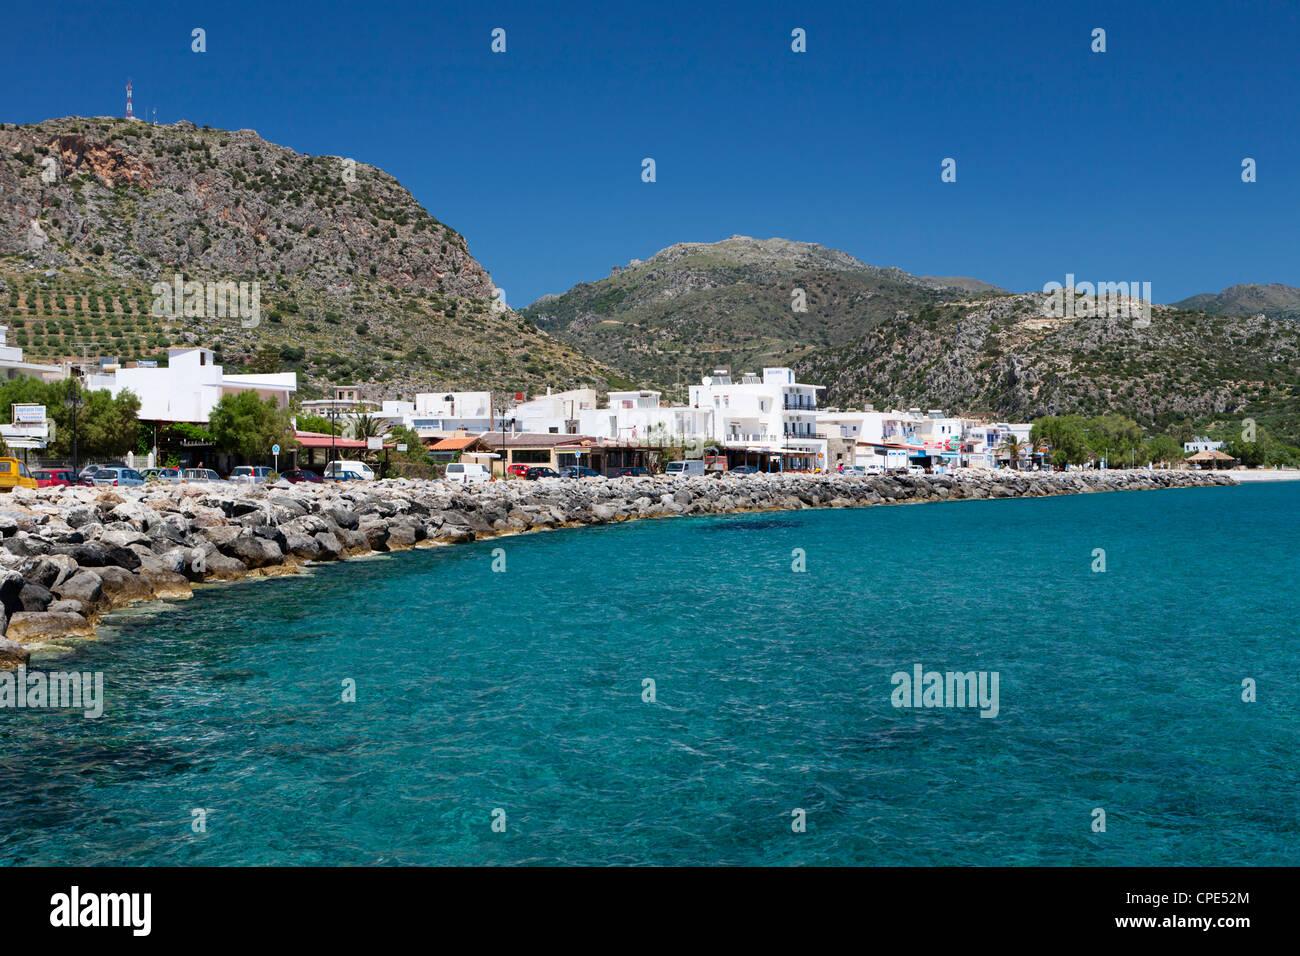 Paleohora, Chania region, Crete, Greek Islands, Greece, Europe - Stock Image